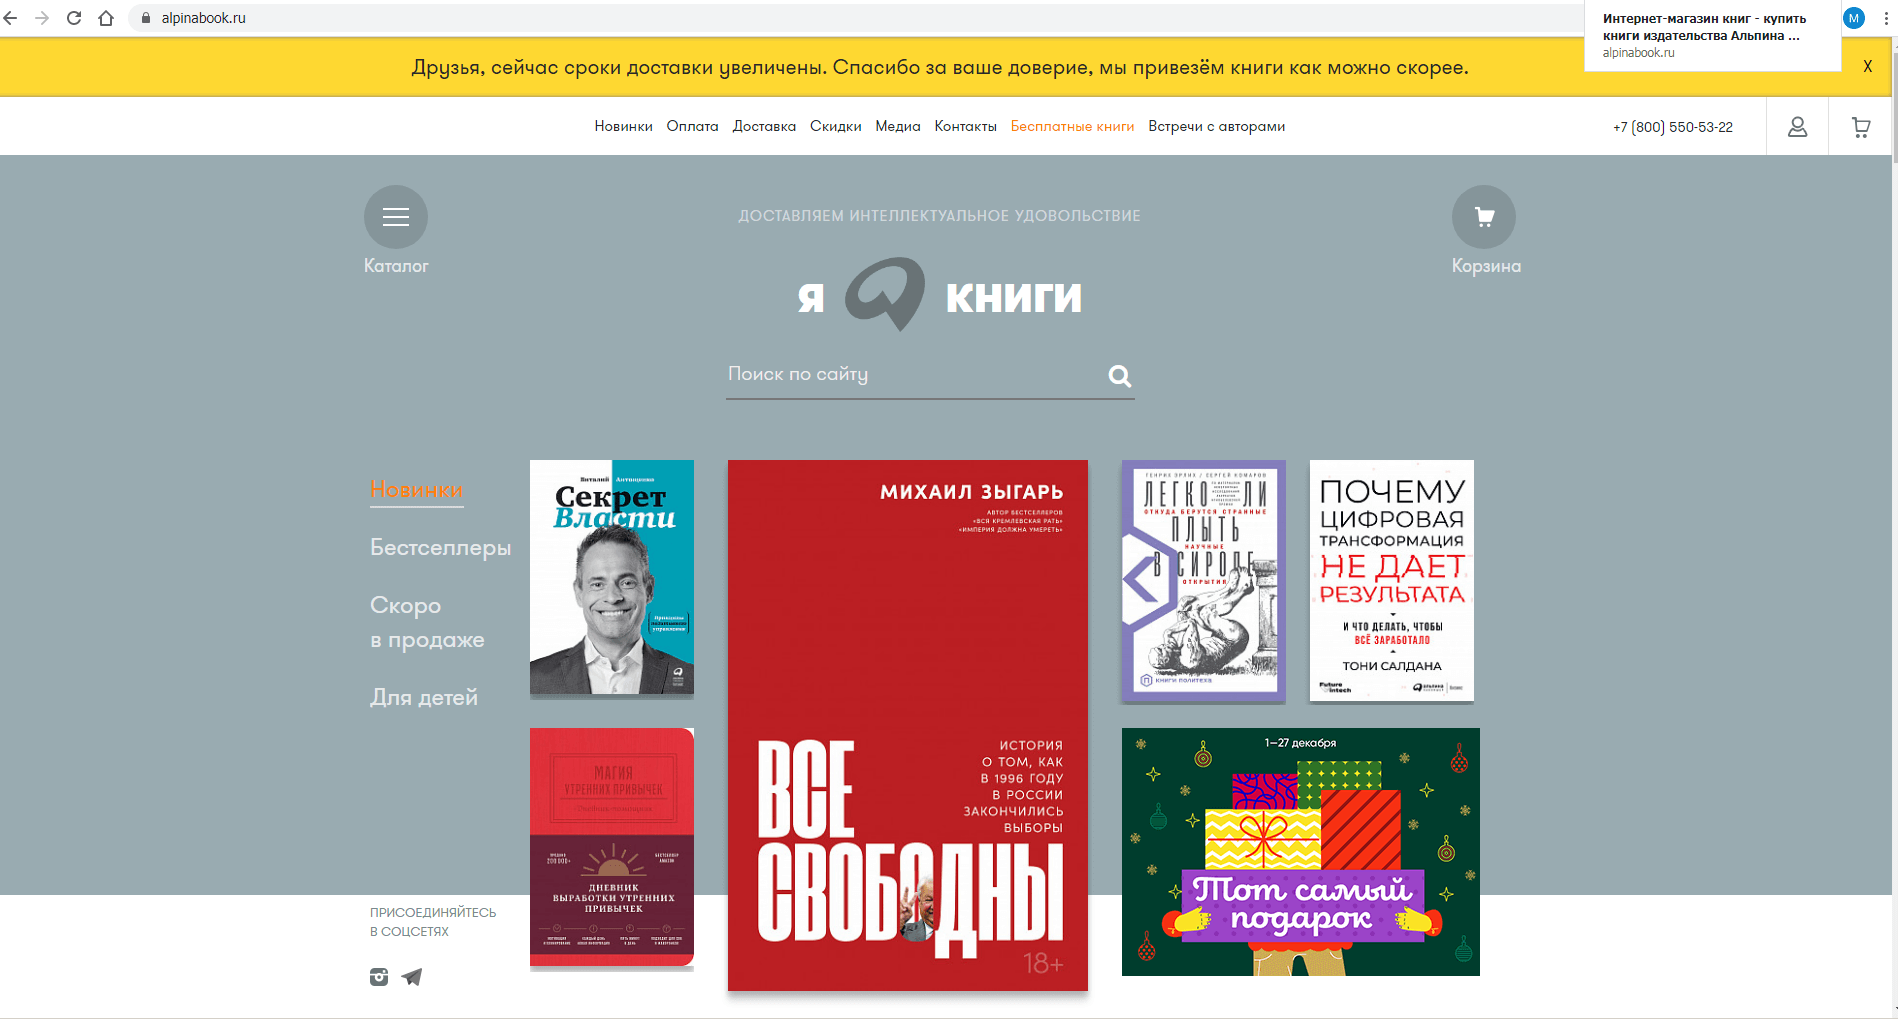 alpinabook.ru website